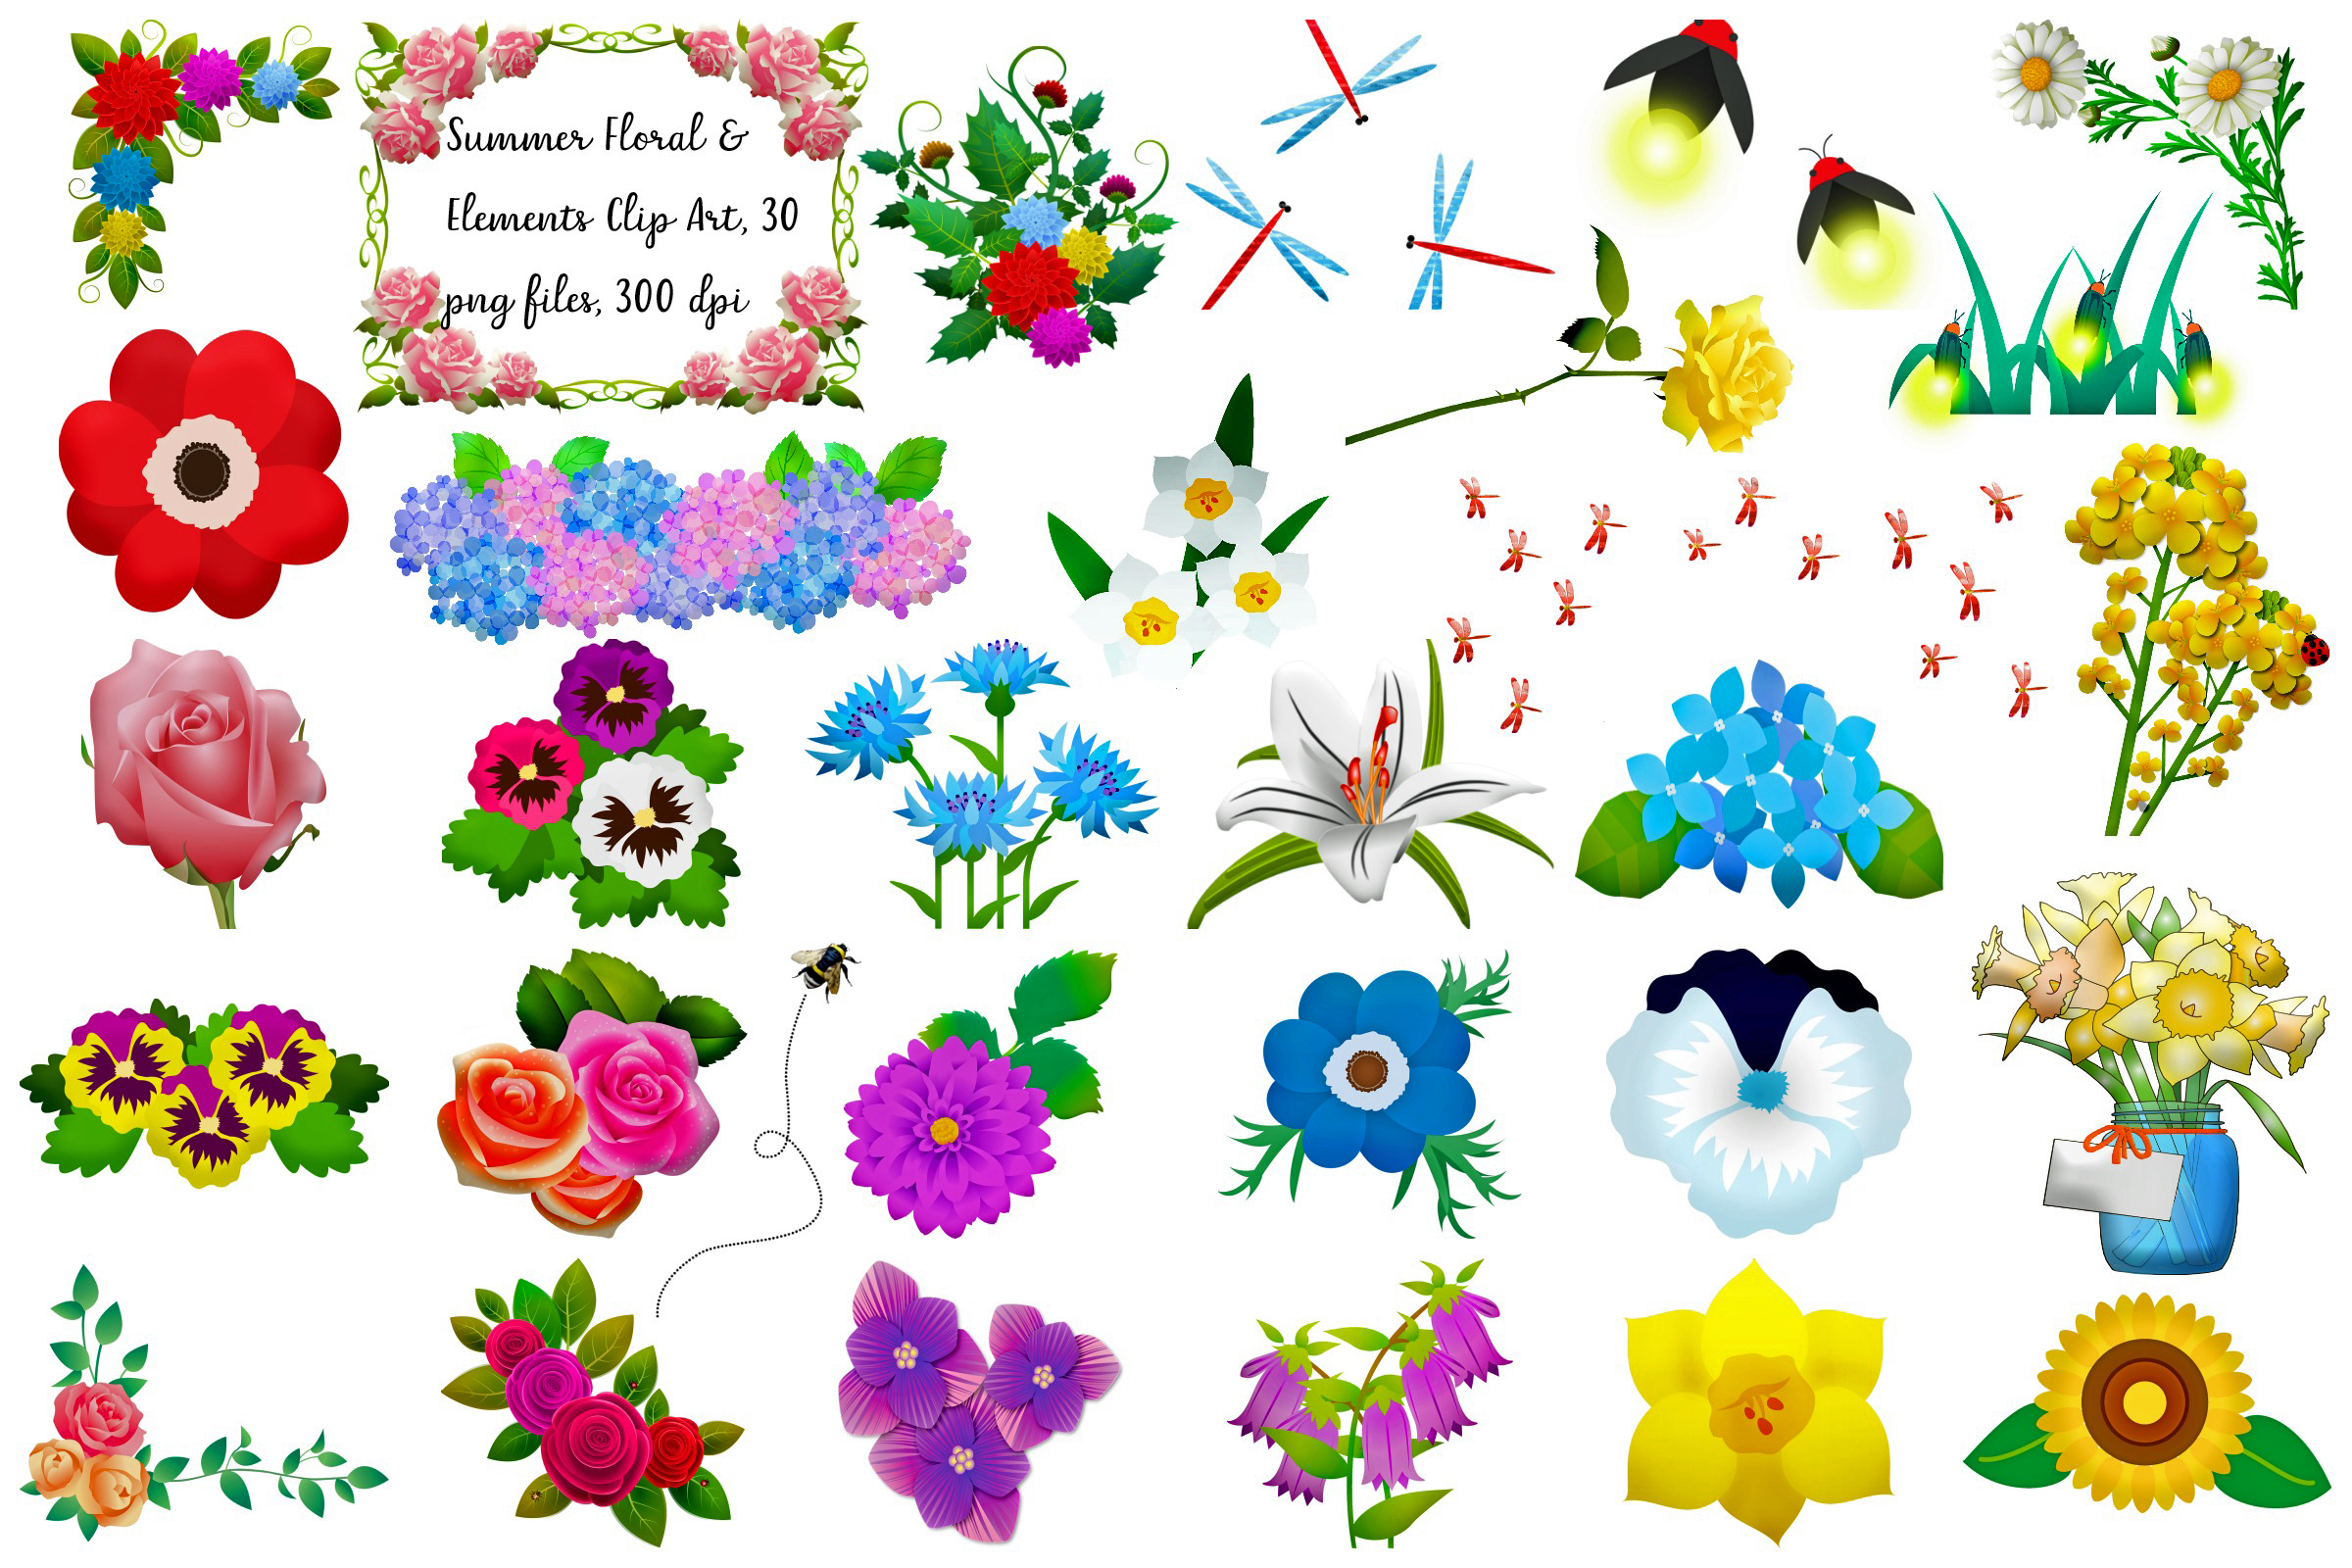 Summer Florals & Elements Clip Art example image 1